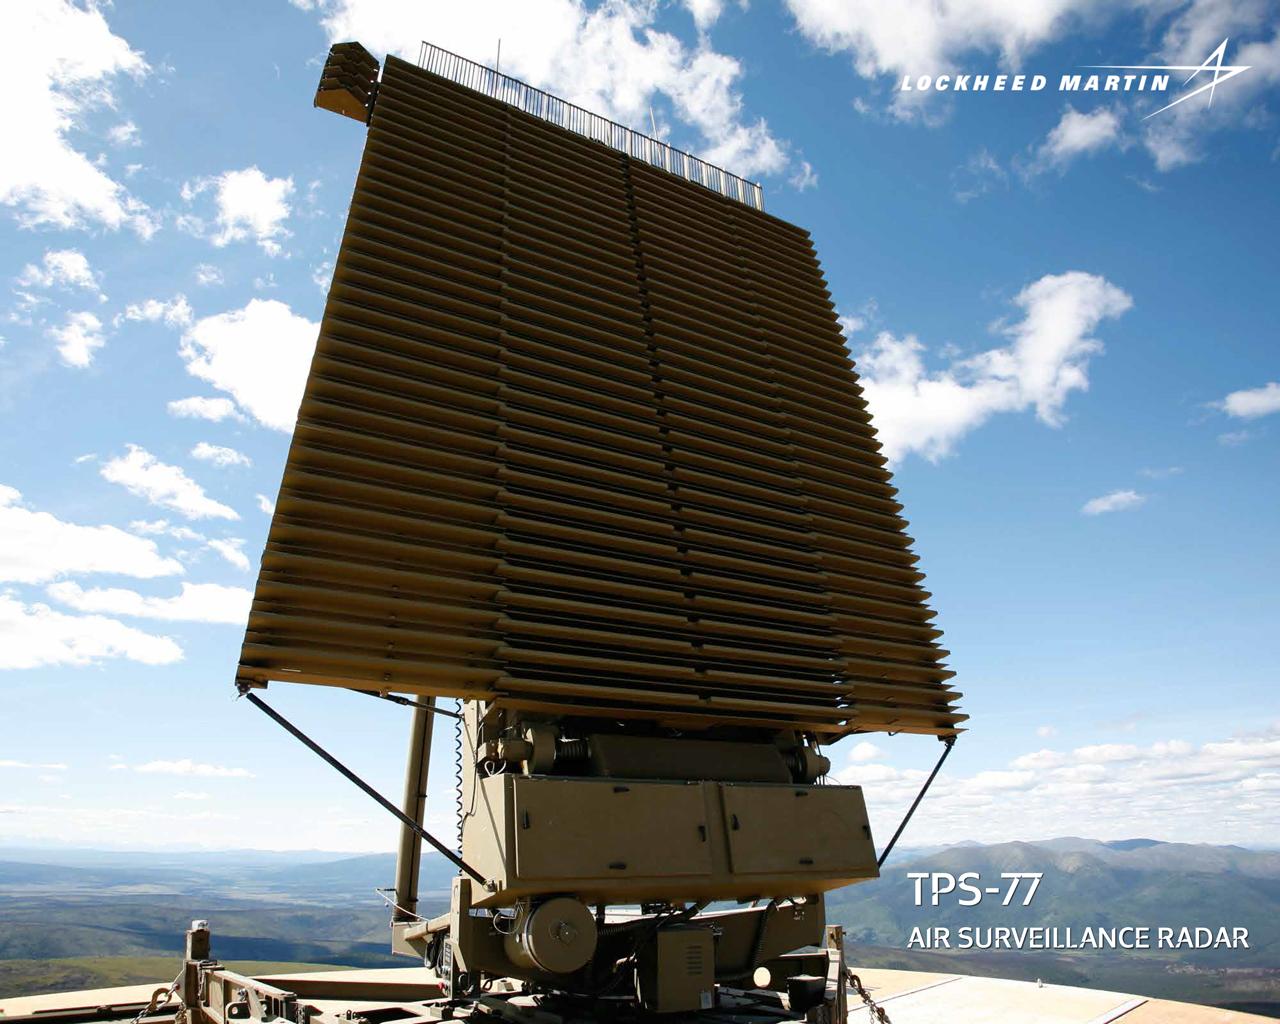 Ground Based Air Surveillance Radars Lockheed Martin